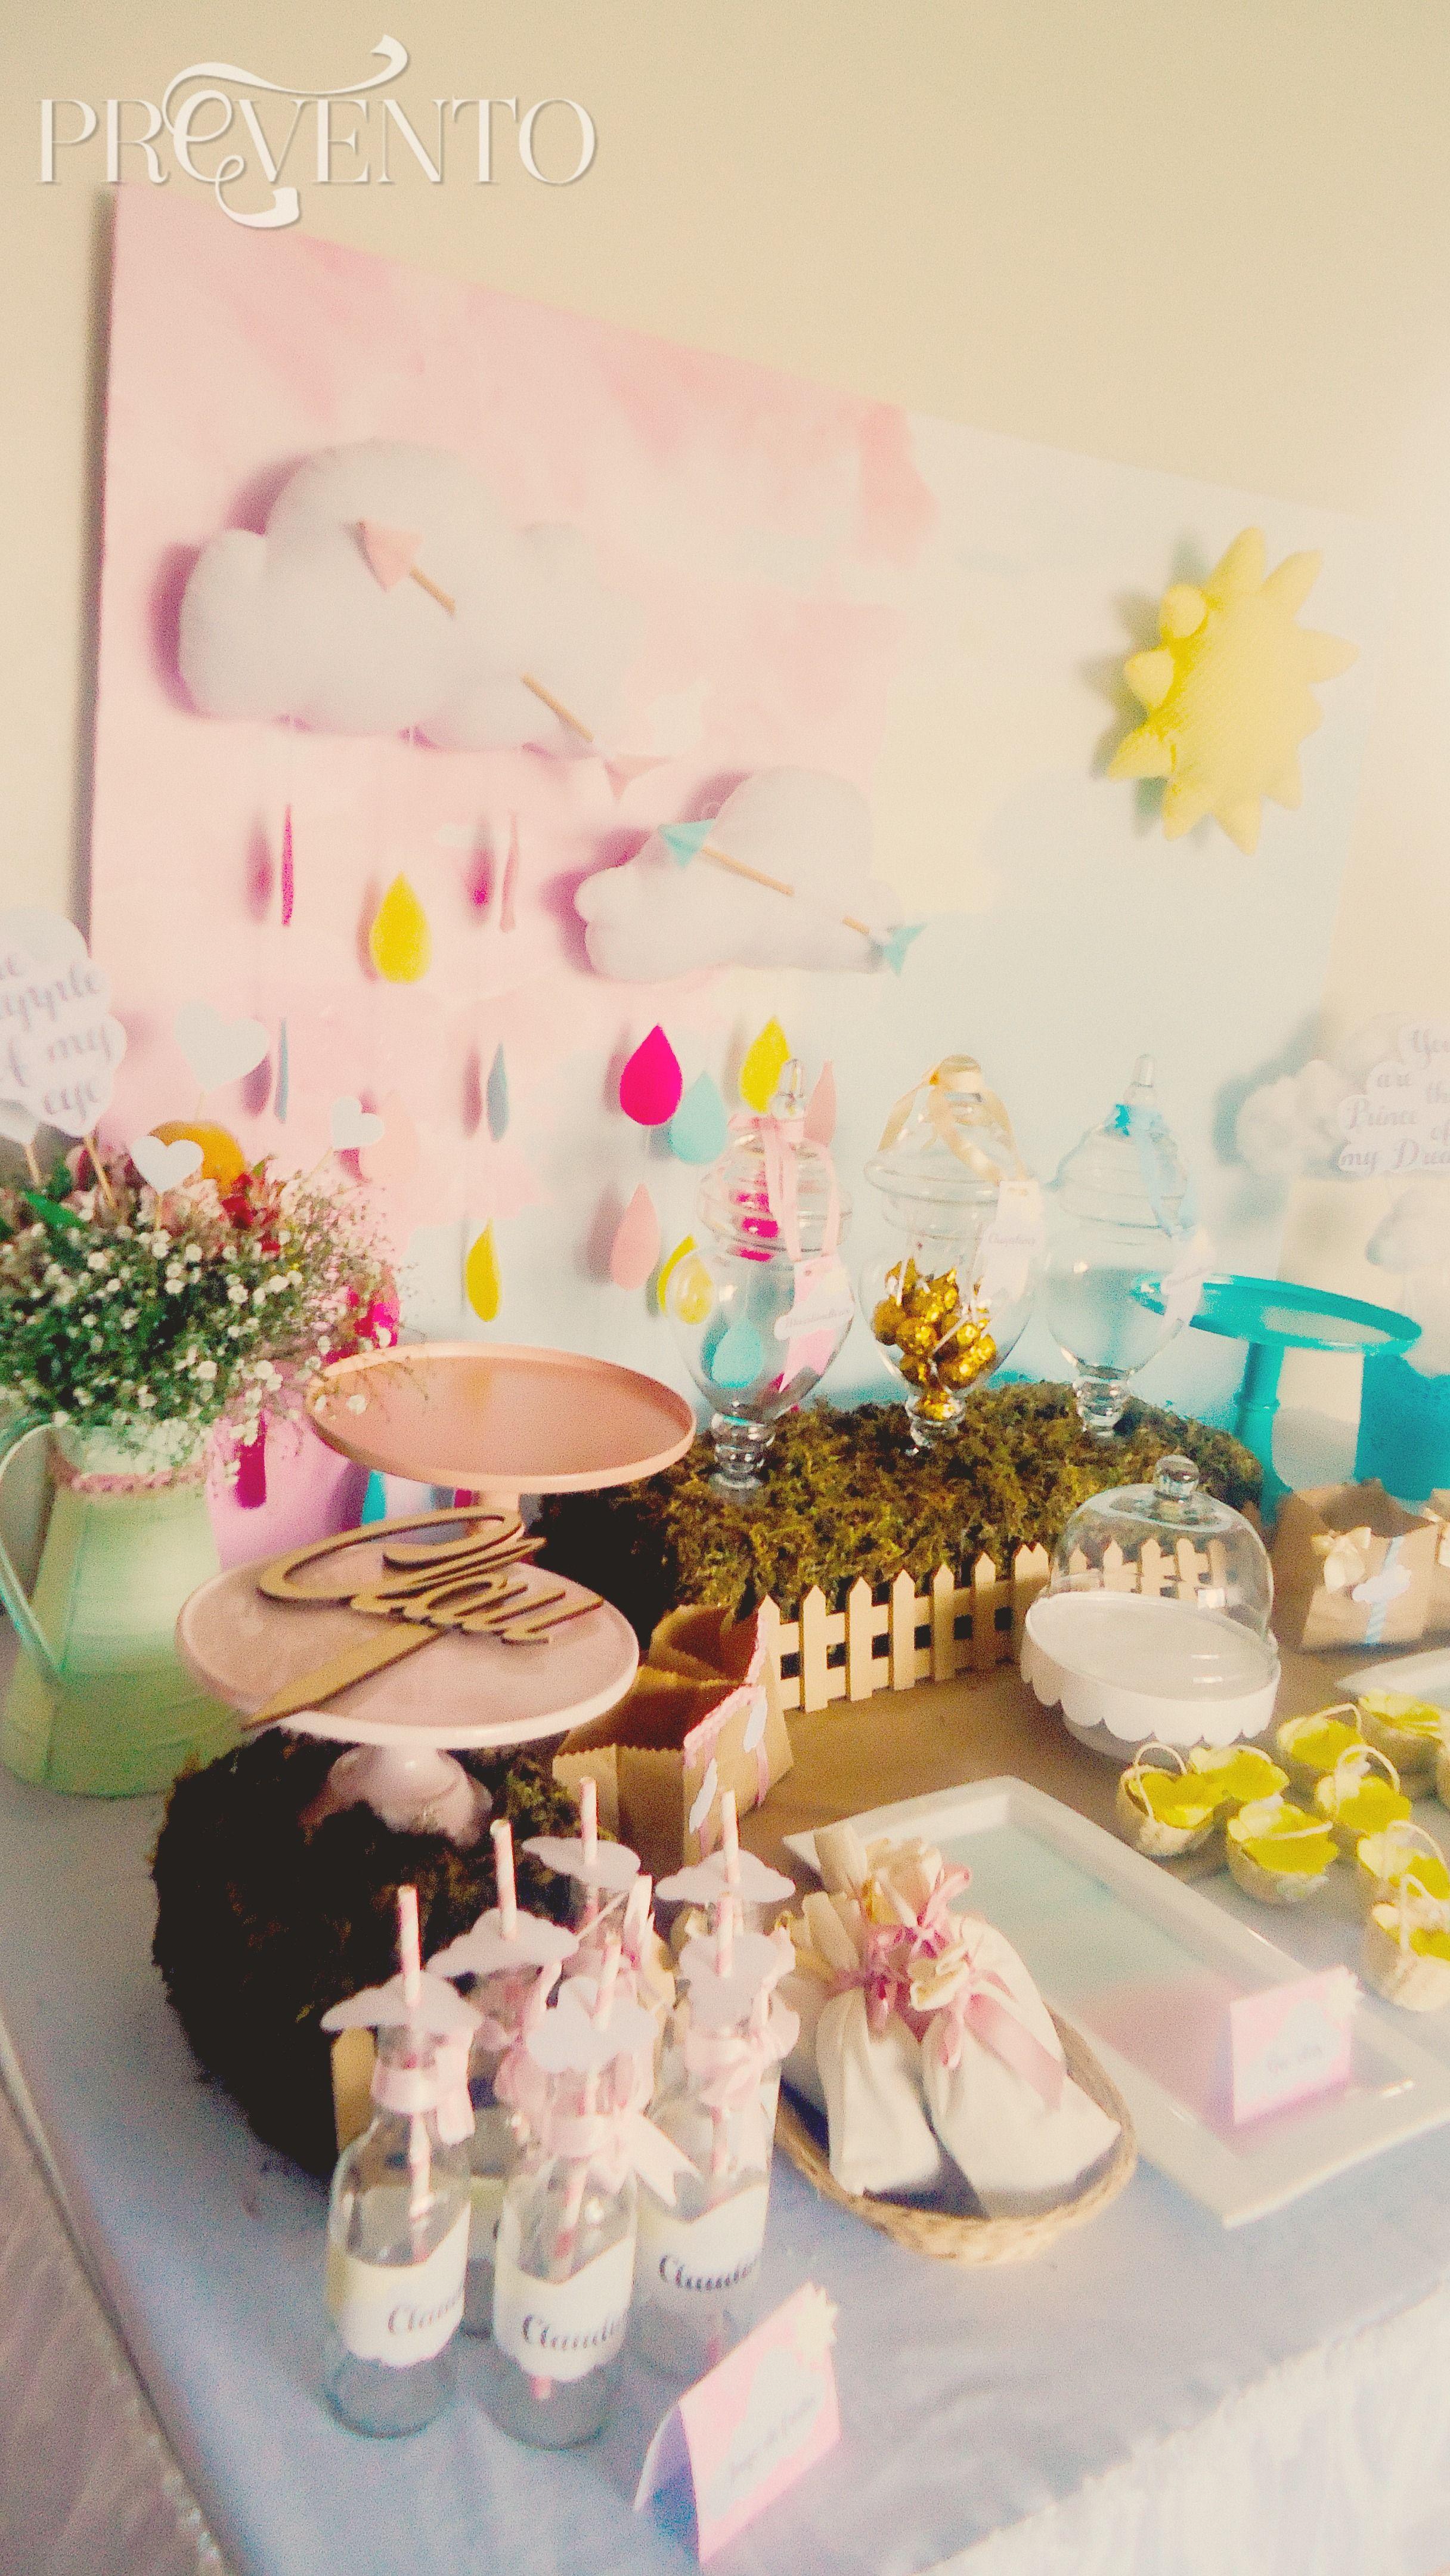 Pin by prevento design on youaremysunshineparty pinterest birthdays garden birthday parties flower gardening ali wings izmirmasajfo